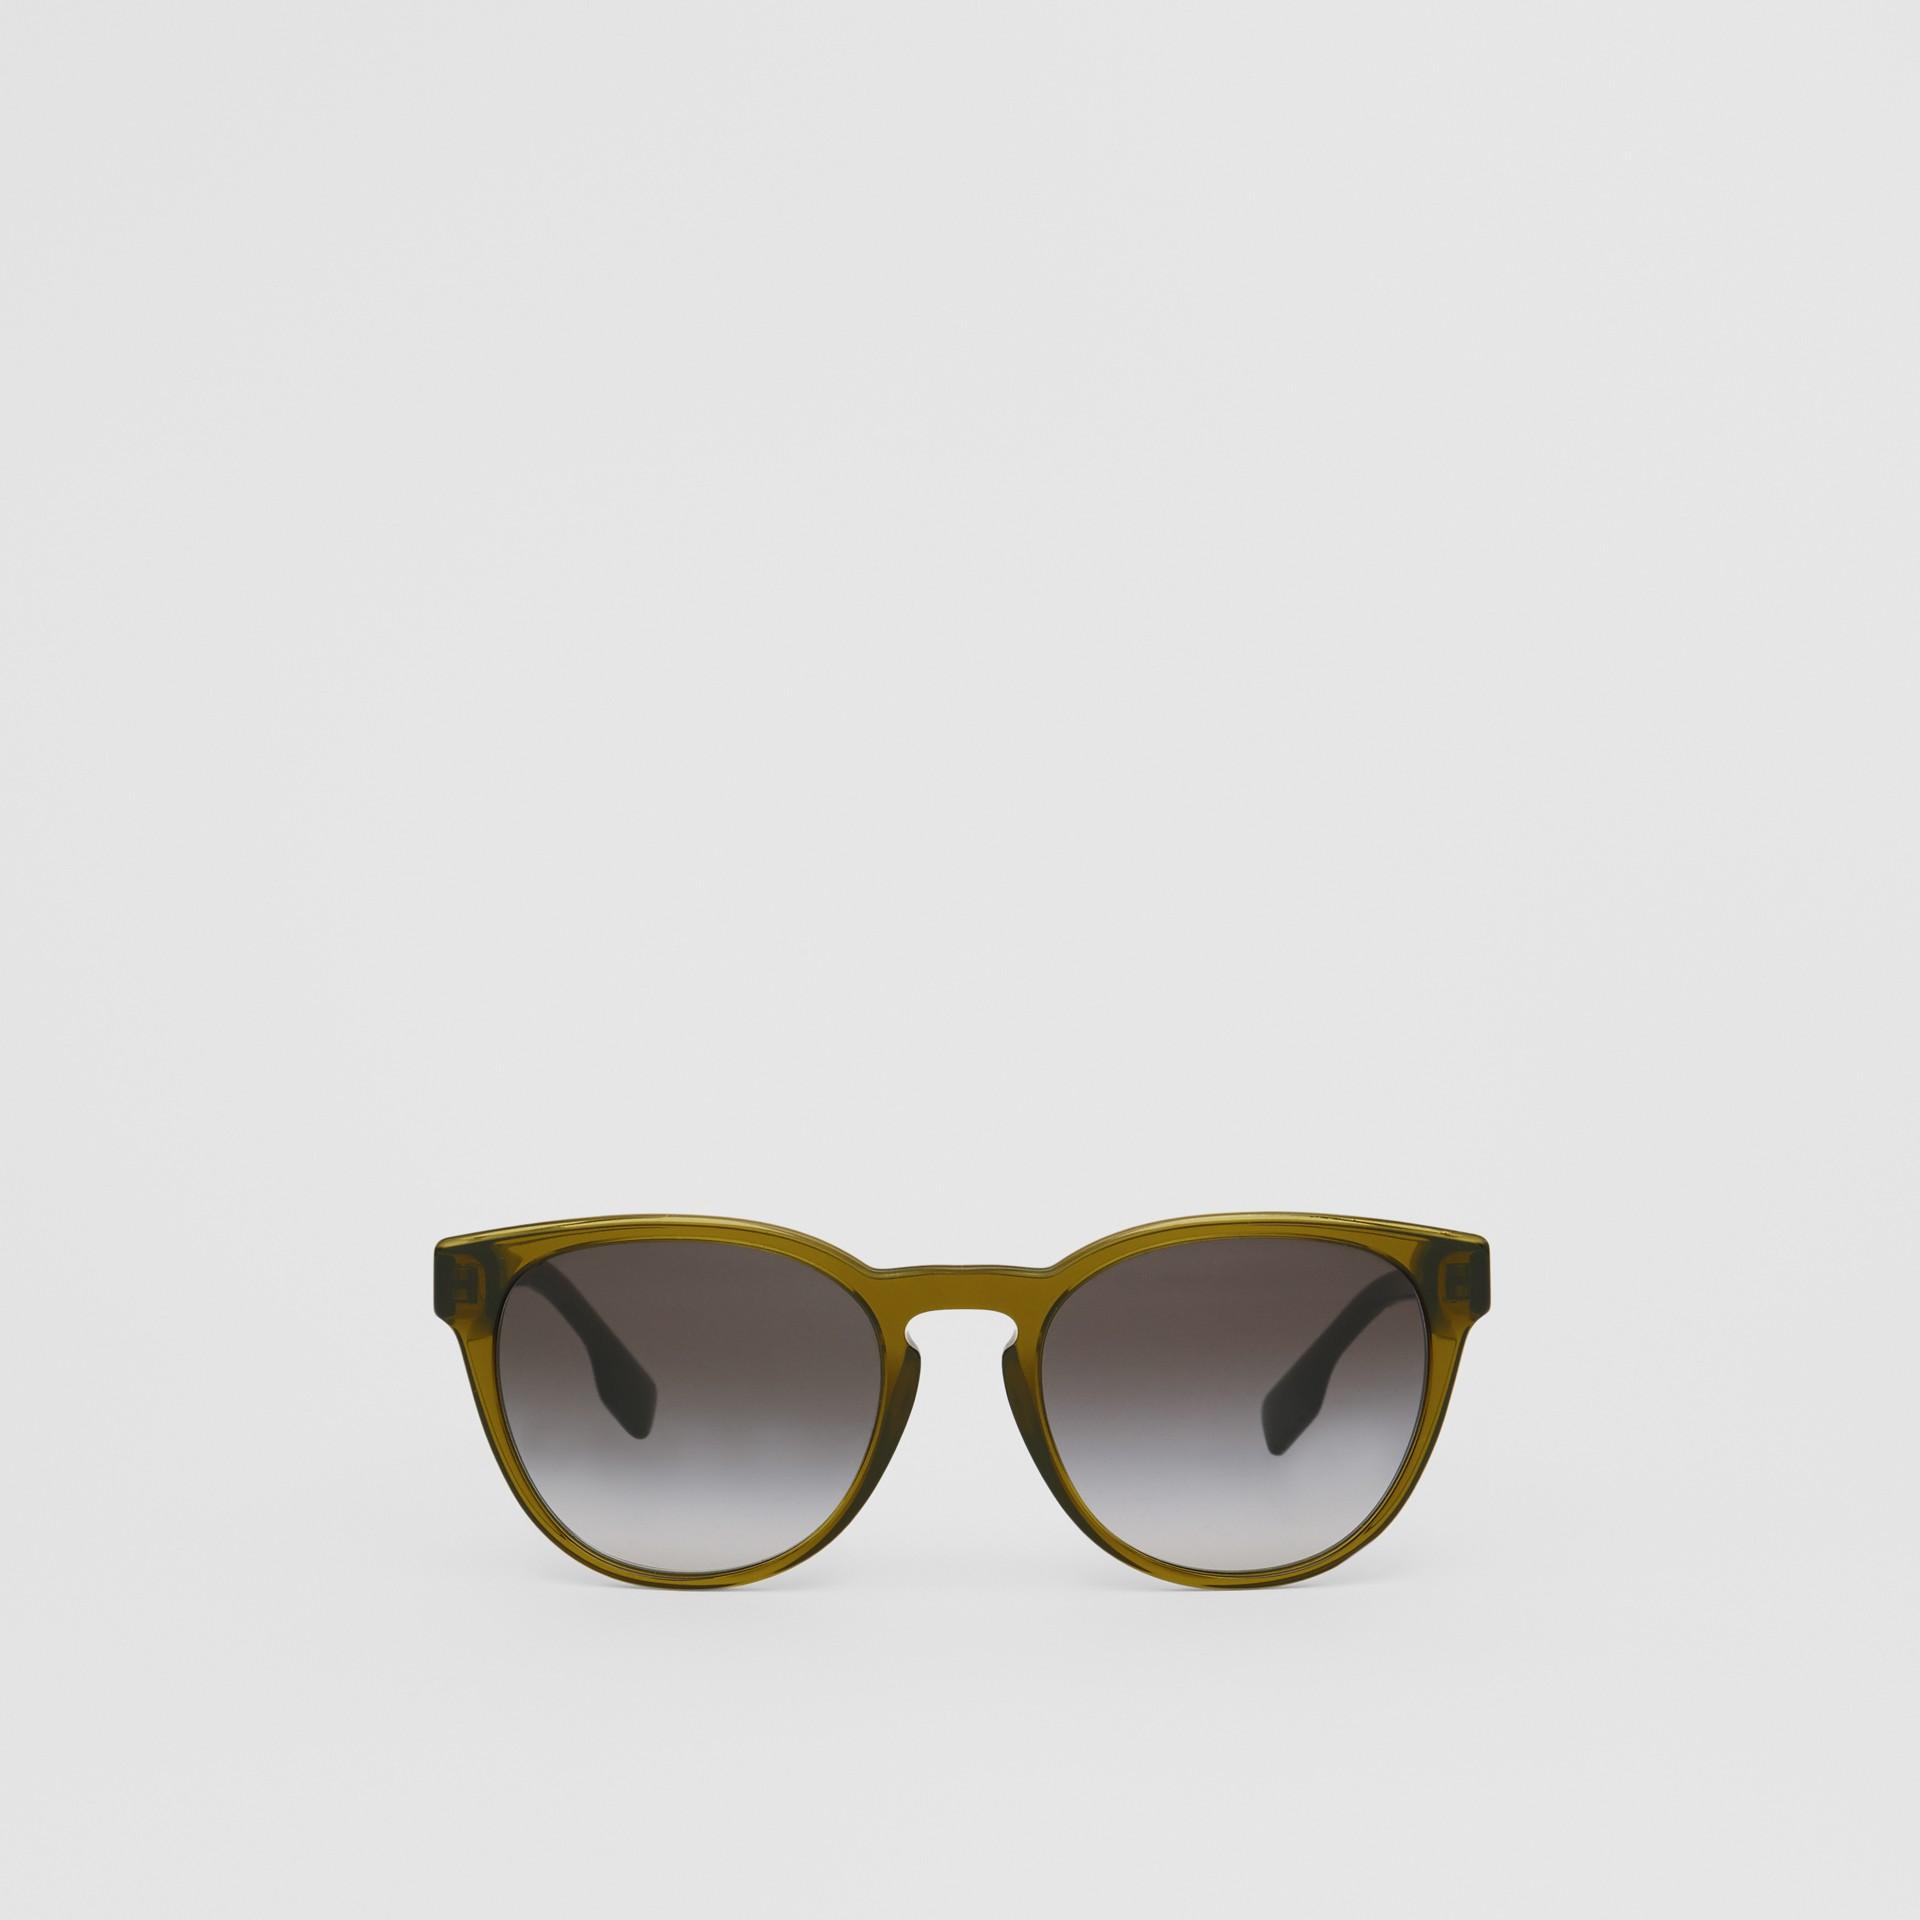 Round Frame Sunglasses in Olive - Men | Burberry Australia - gallery image 0